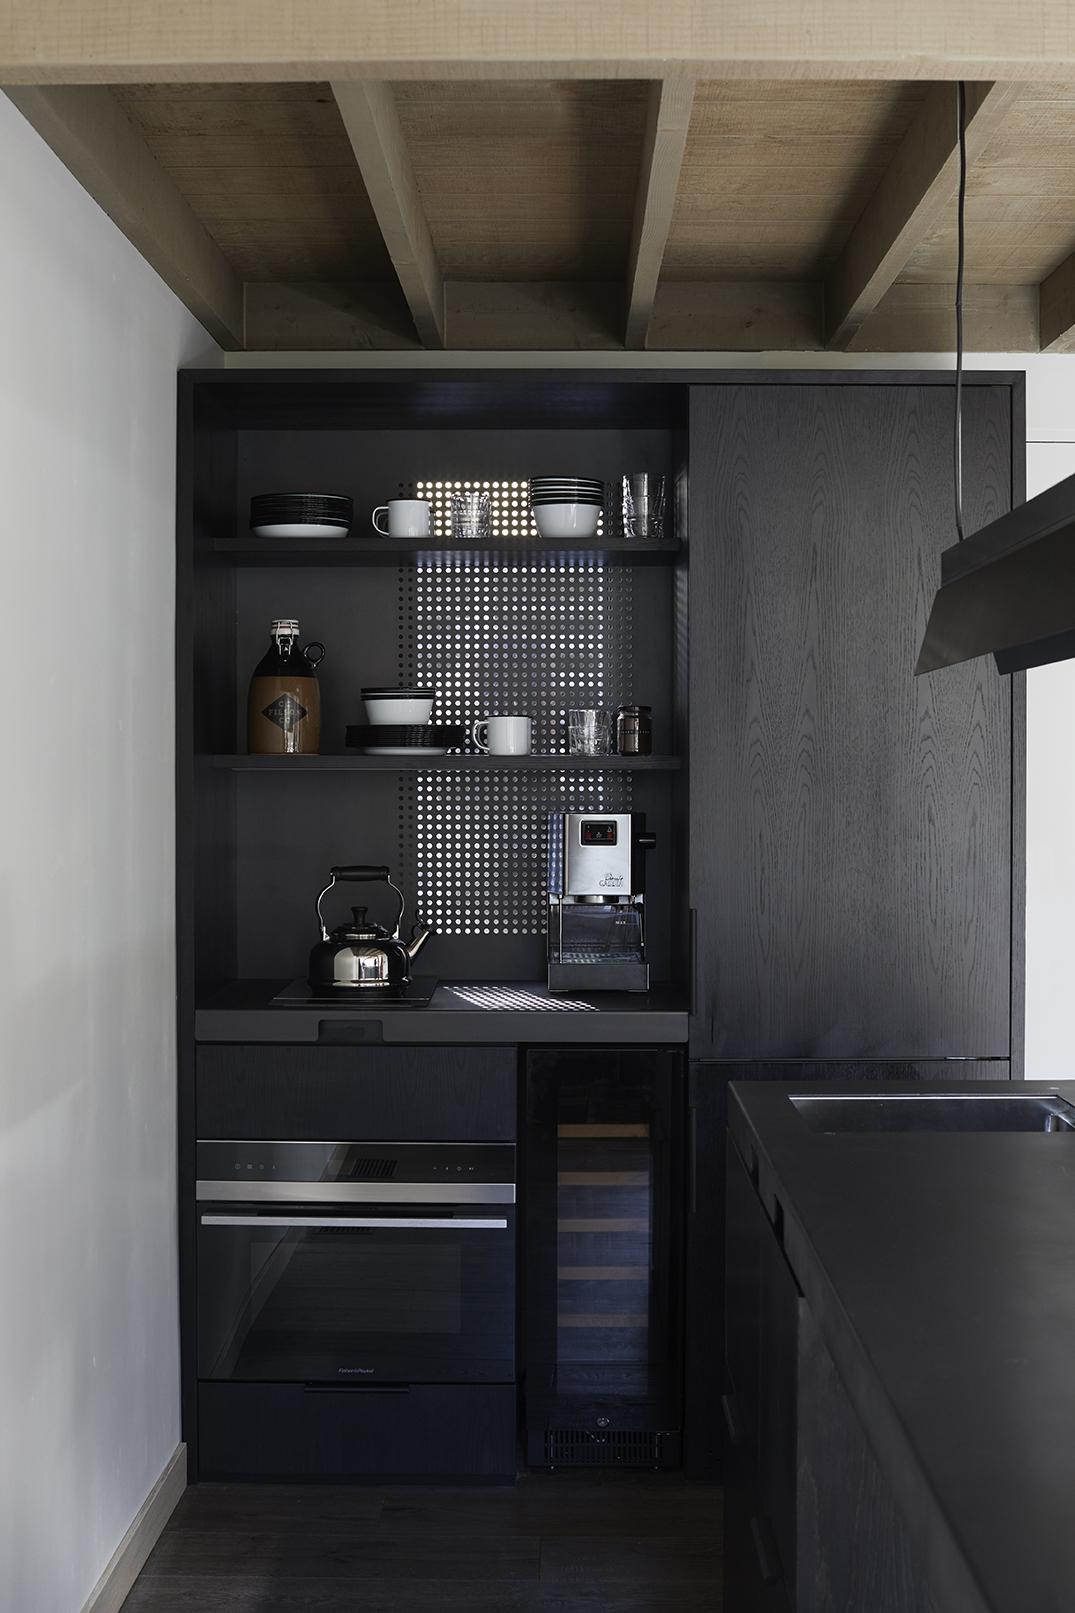 The kitchen in the Cedar Cabin